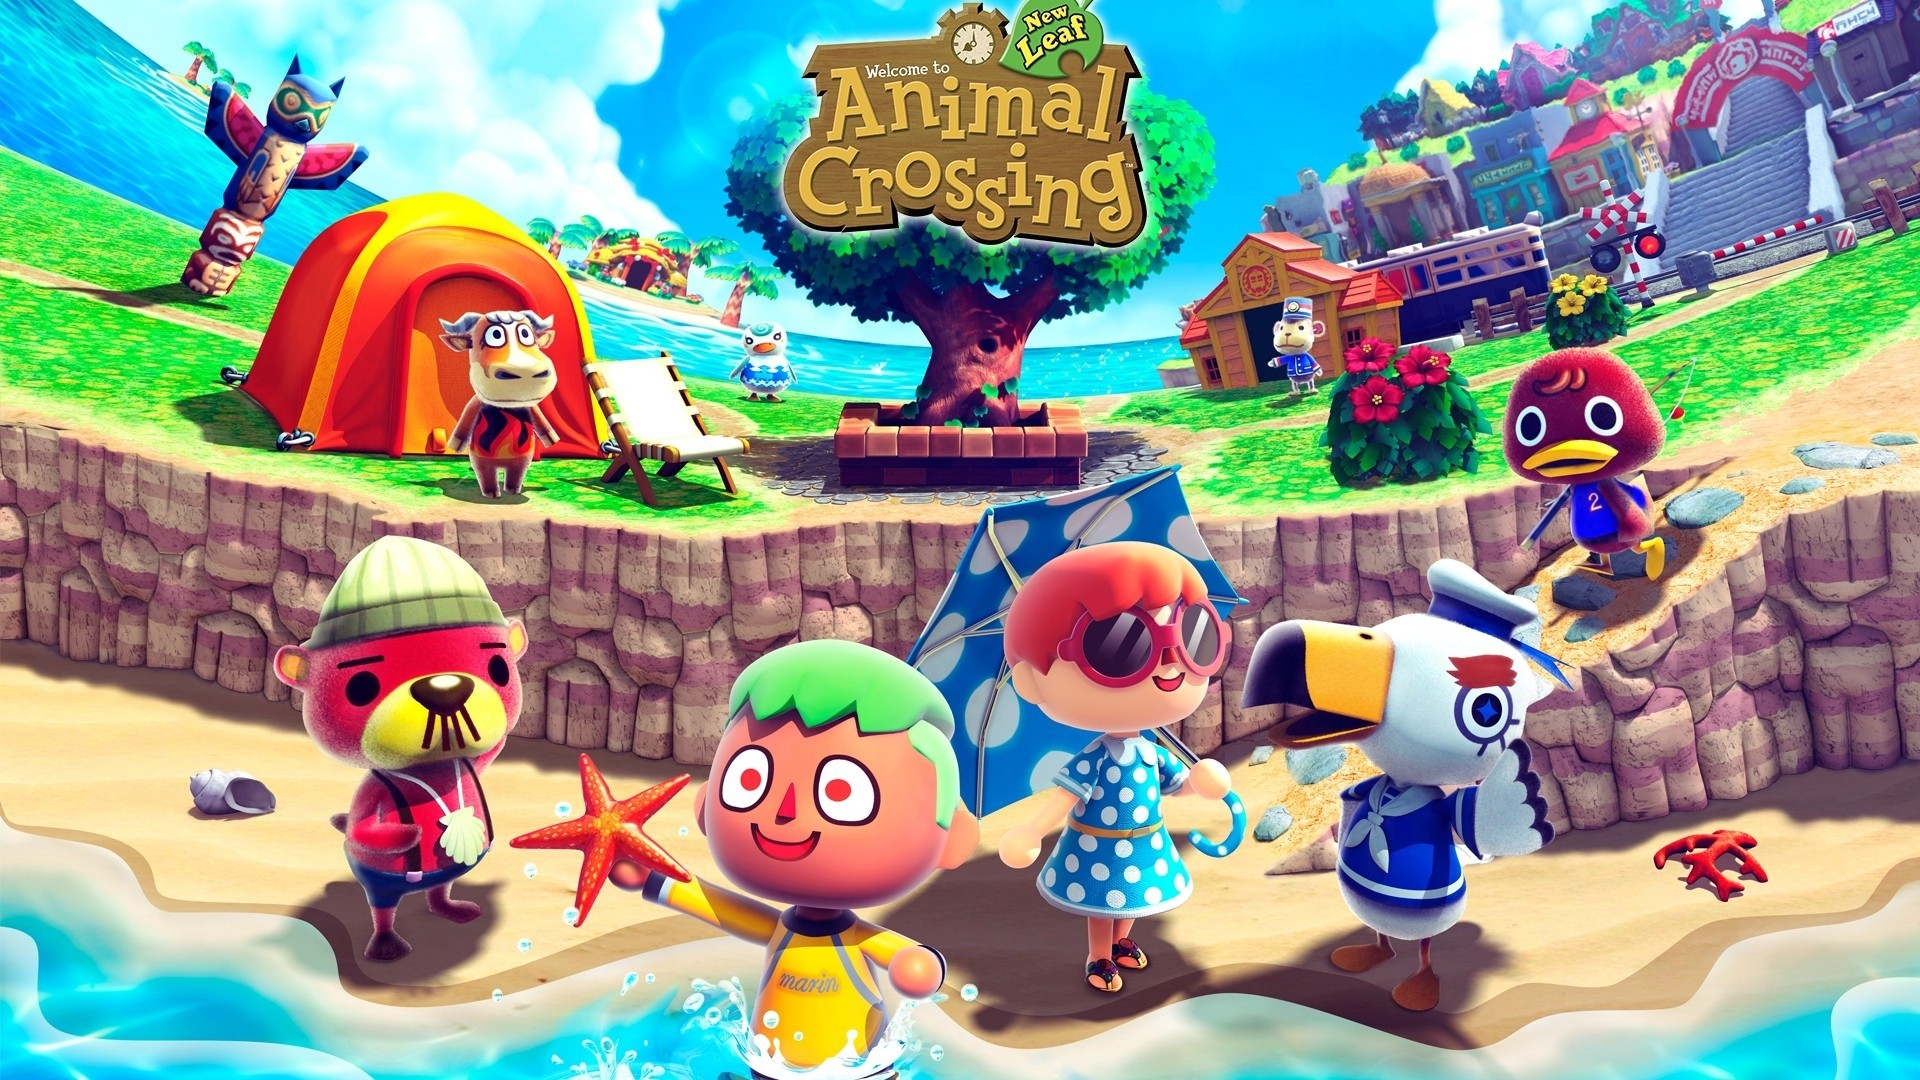 Animal Crossing a wallpaper